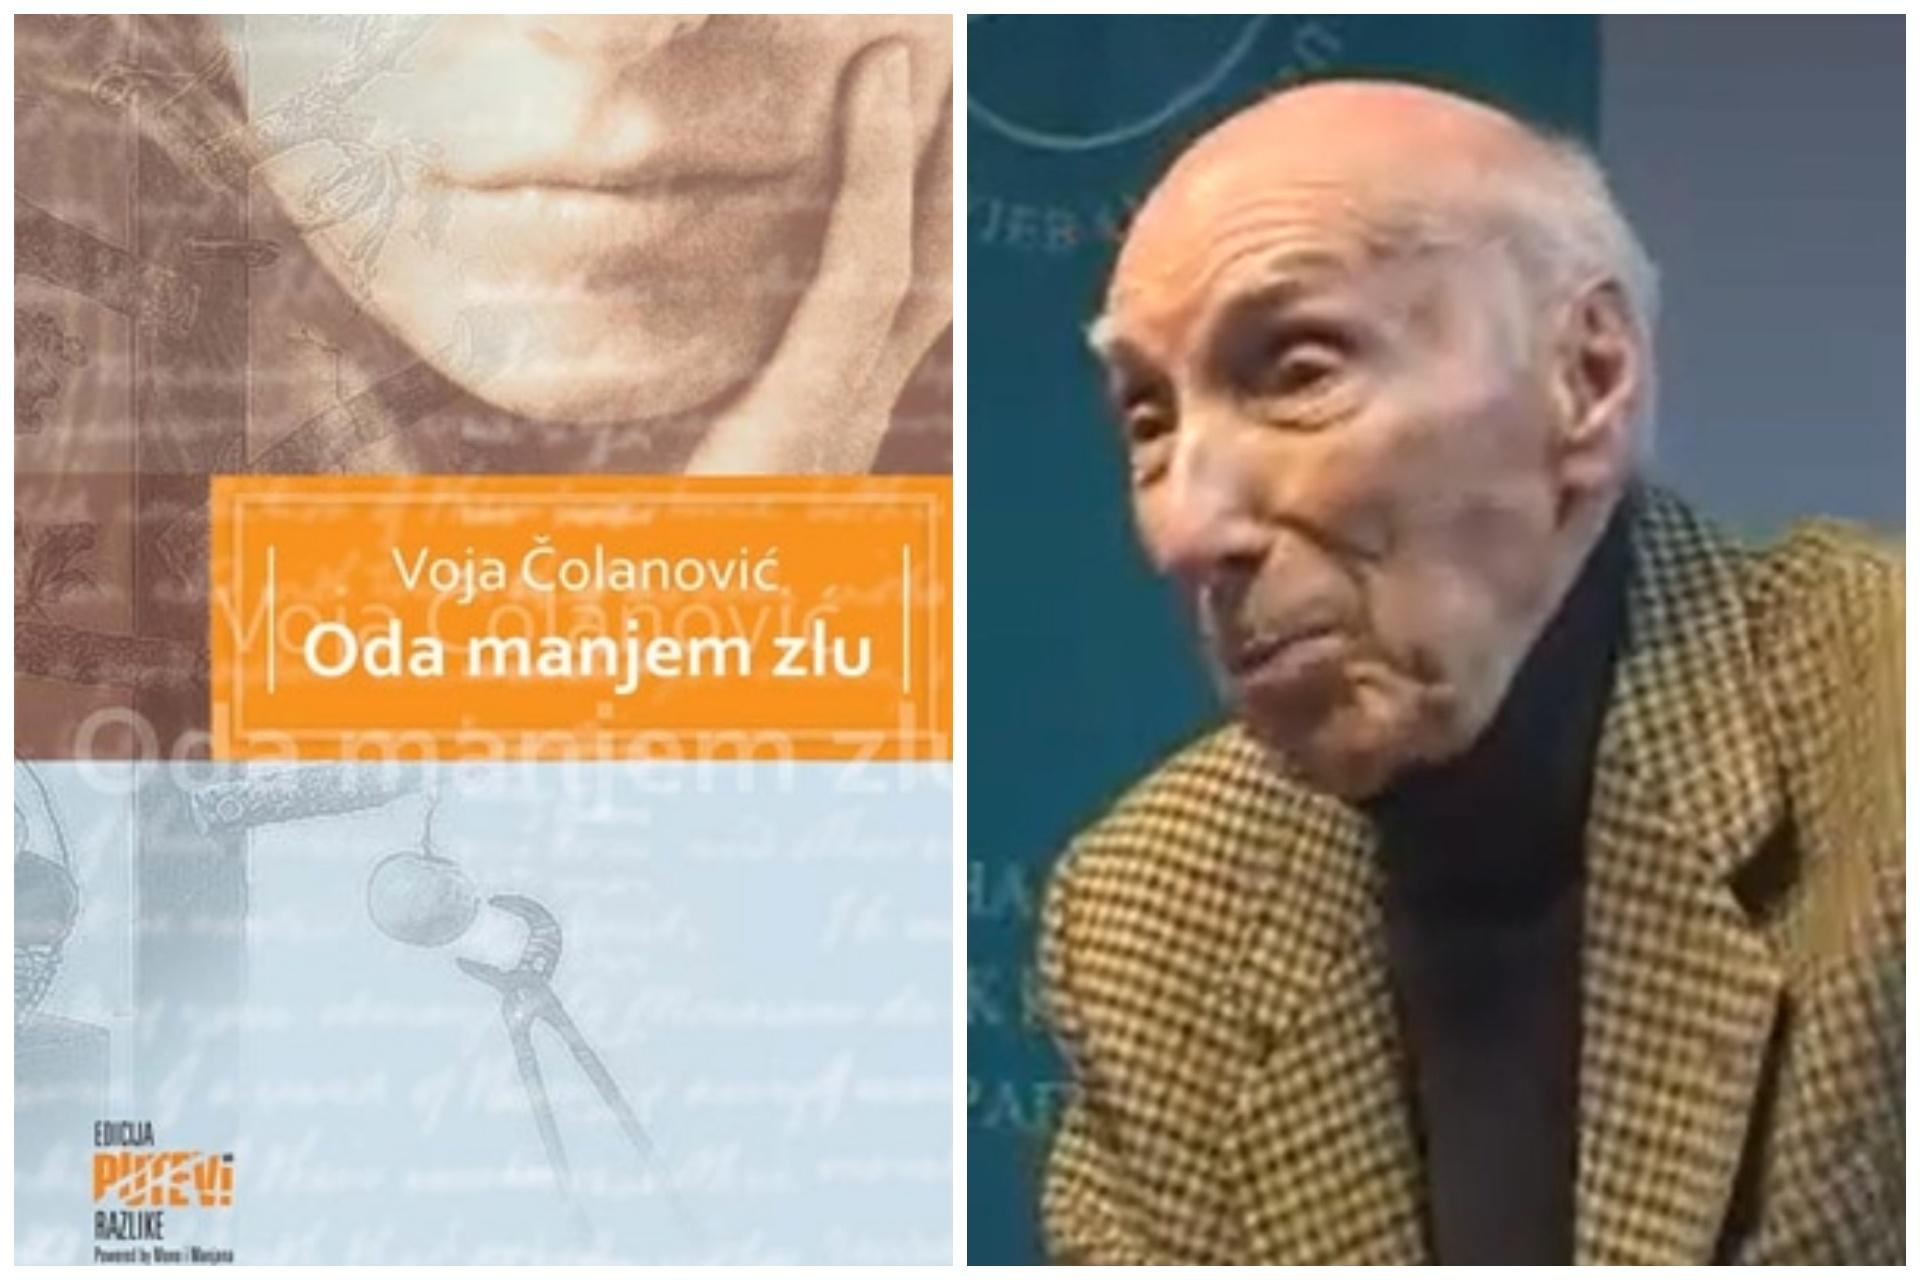 Voja Čolanović, Oda manjem zlu